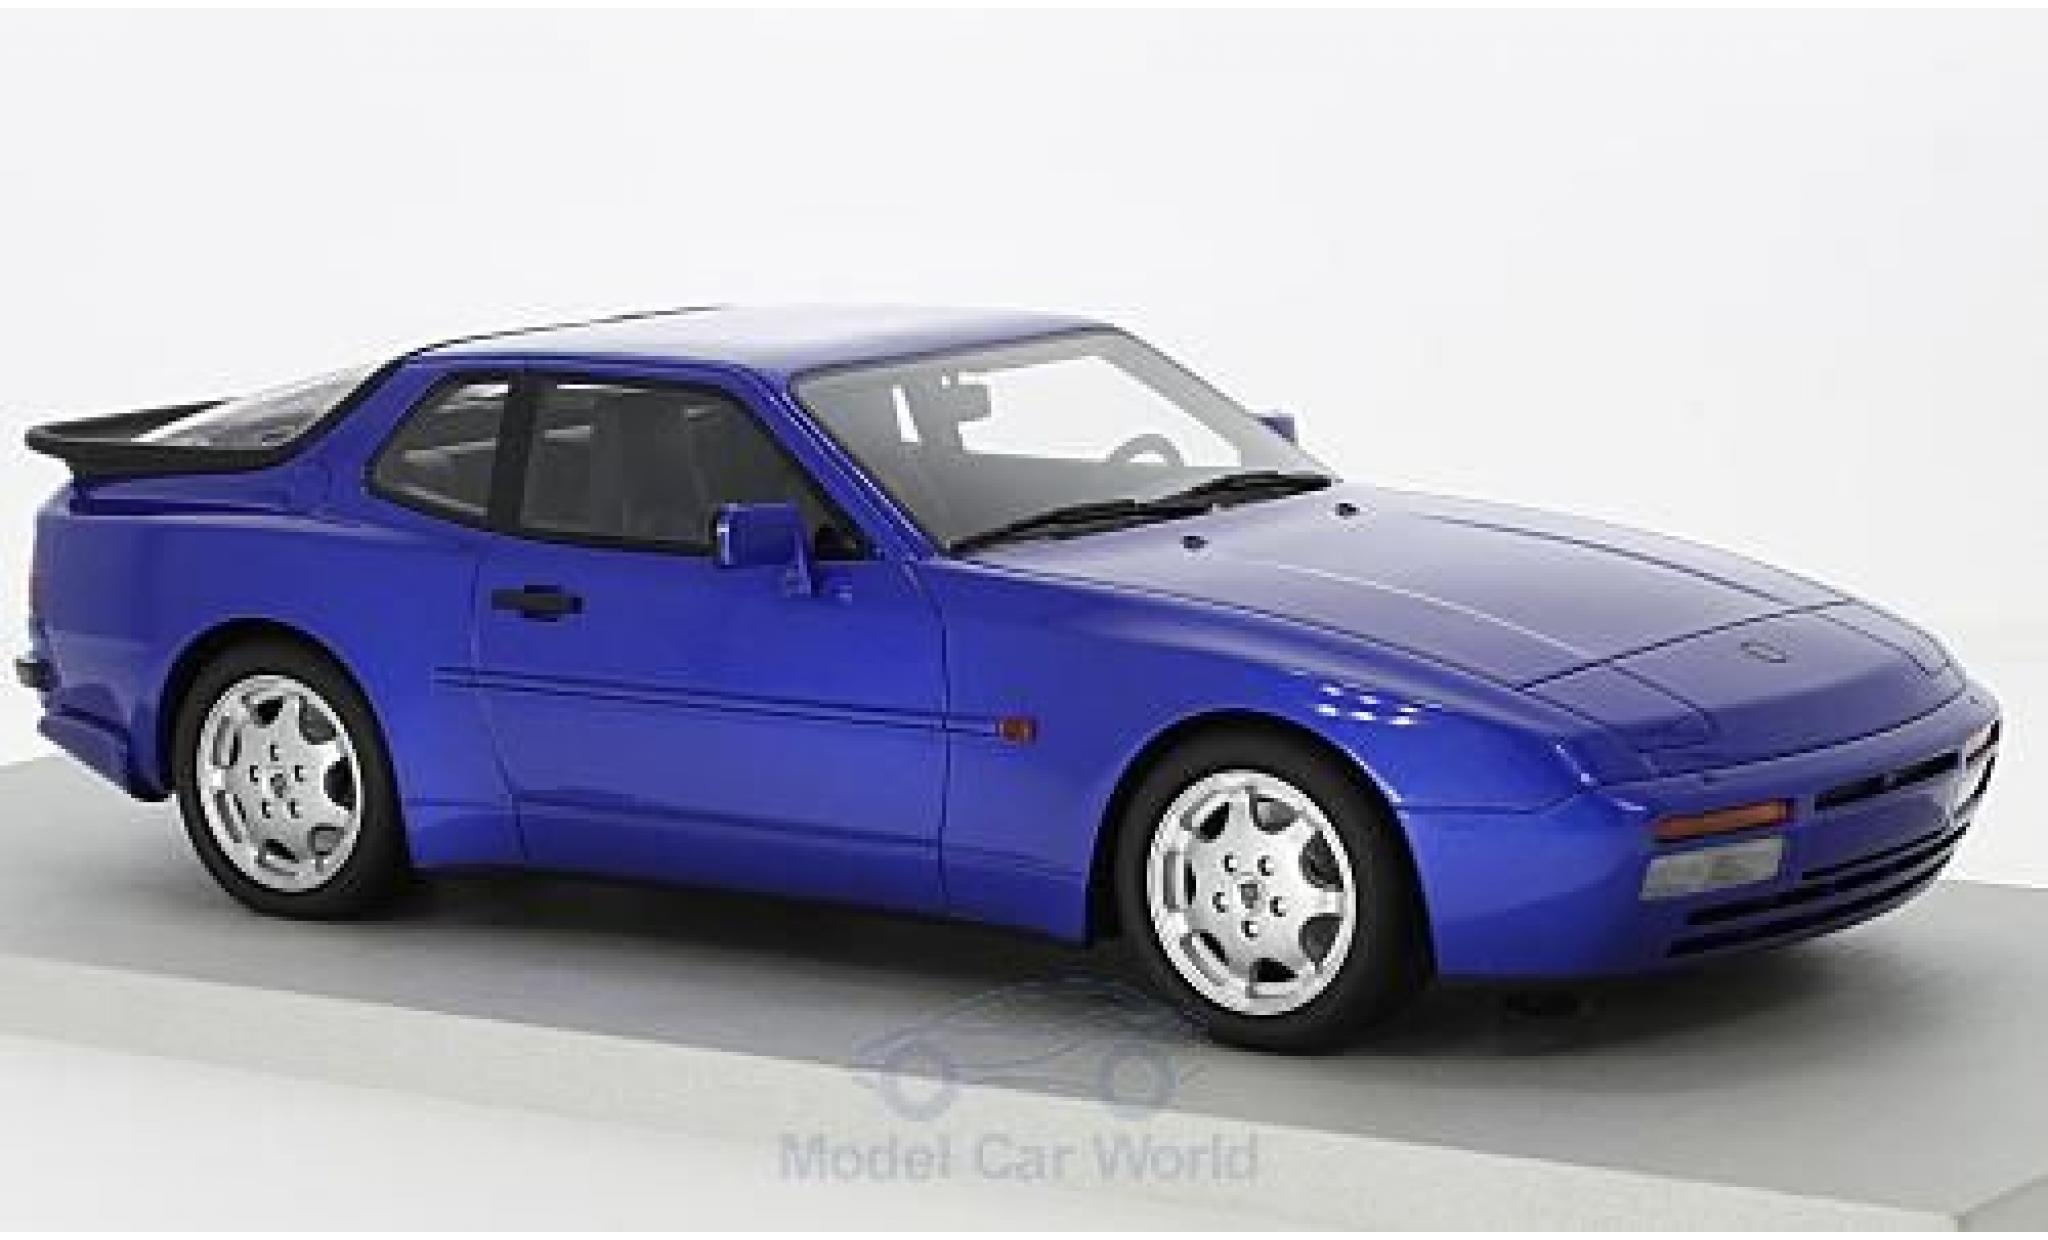 Porsche 944 1991 1/18 Lucky Step Models Turbo S metallise blue